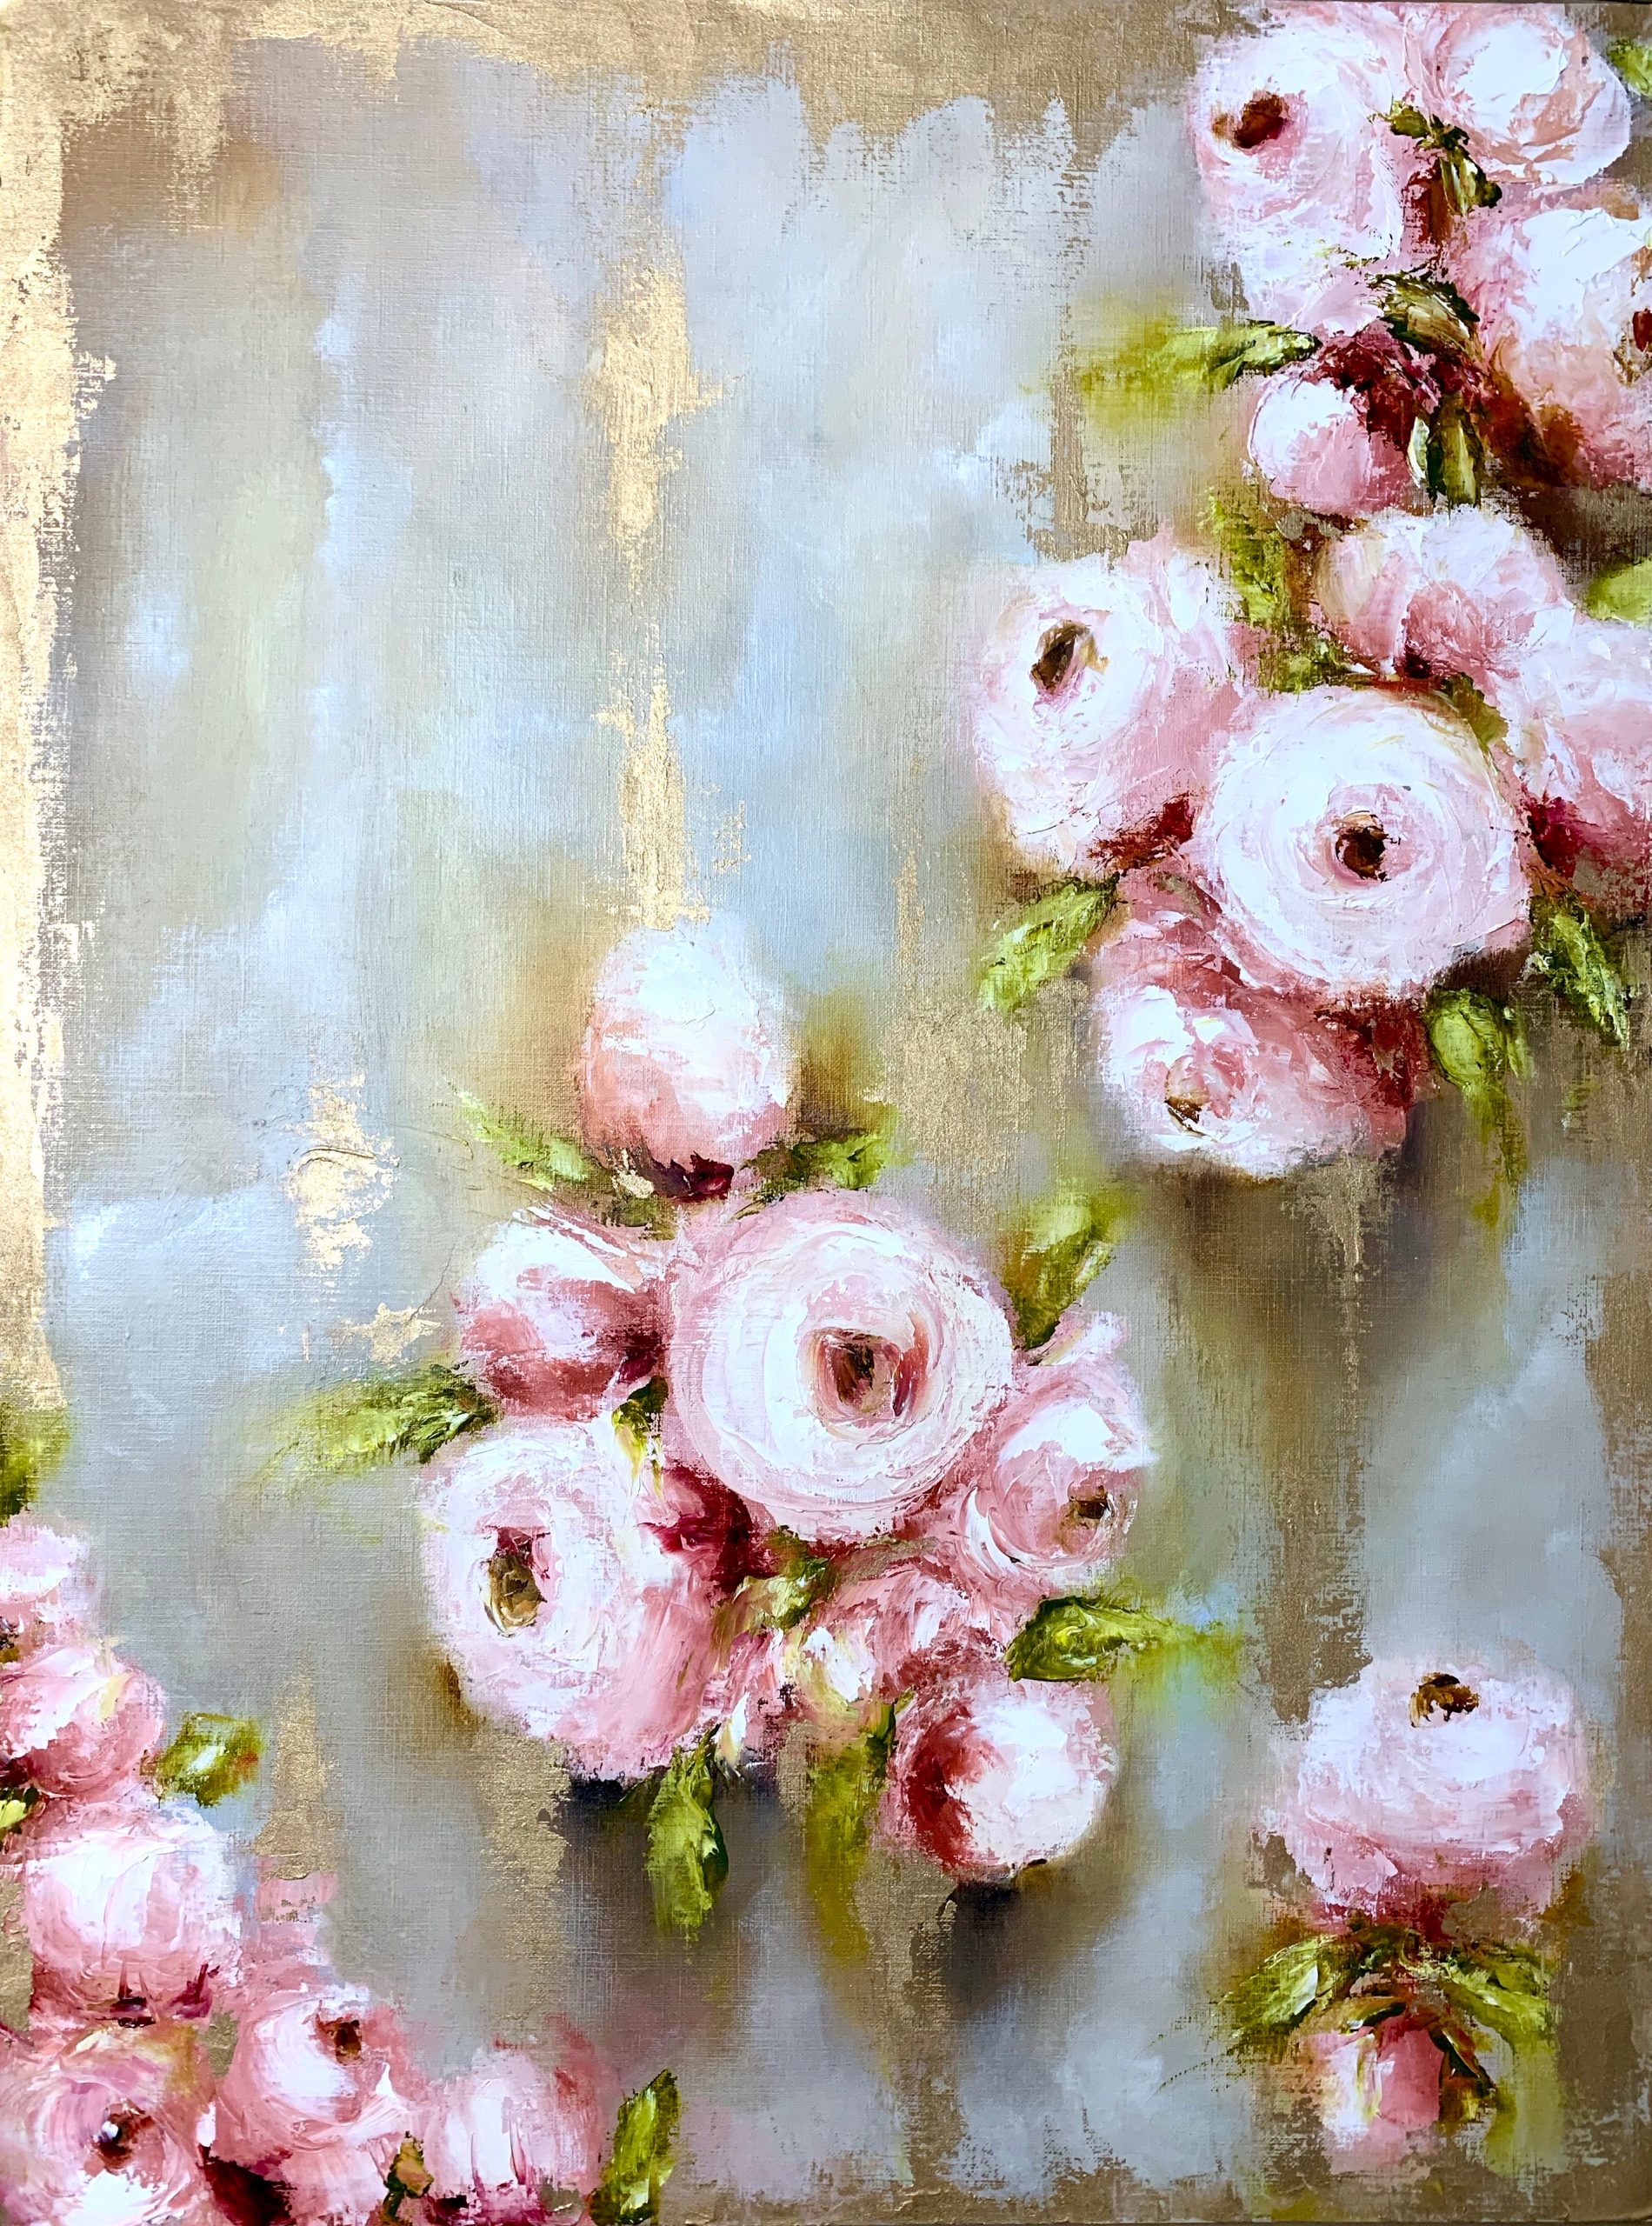 Inside the Dreamy Floral World of Amy Elizabeth Fine Art